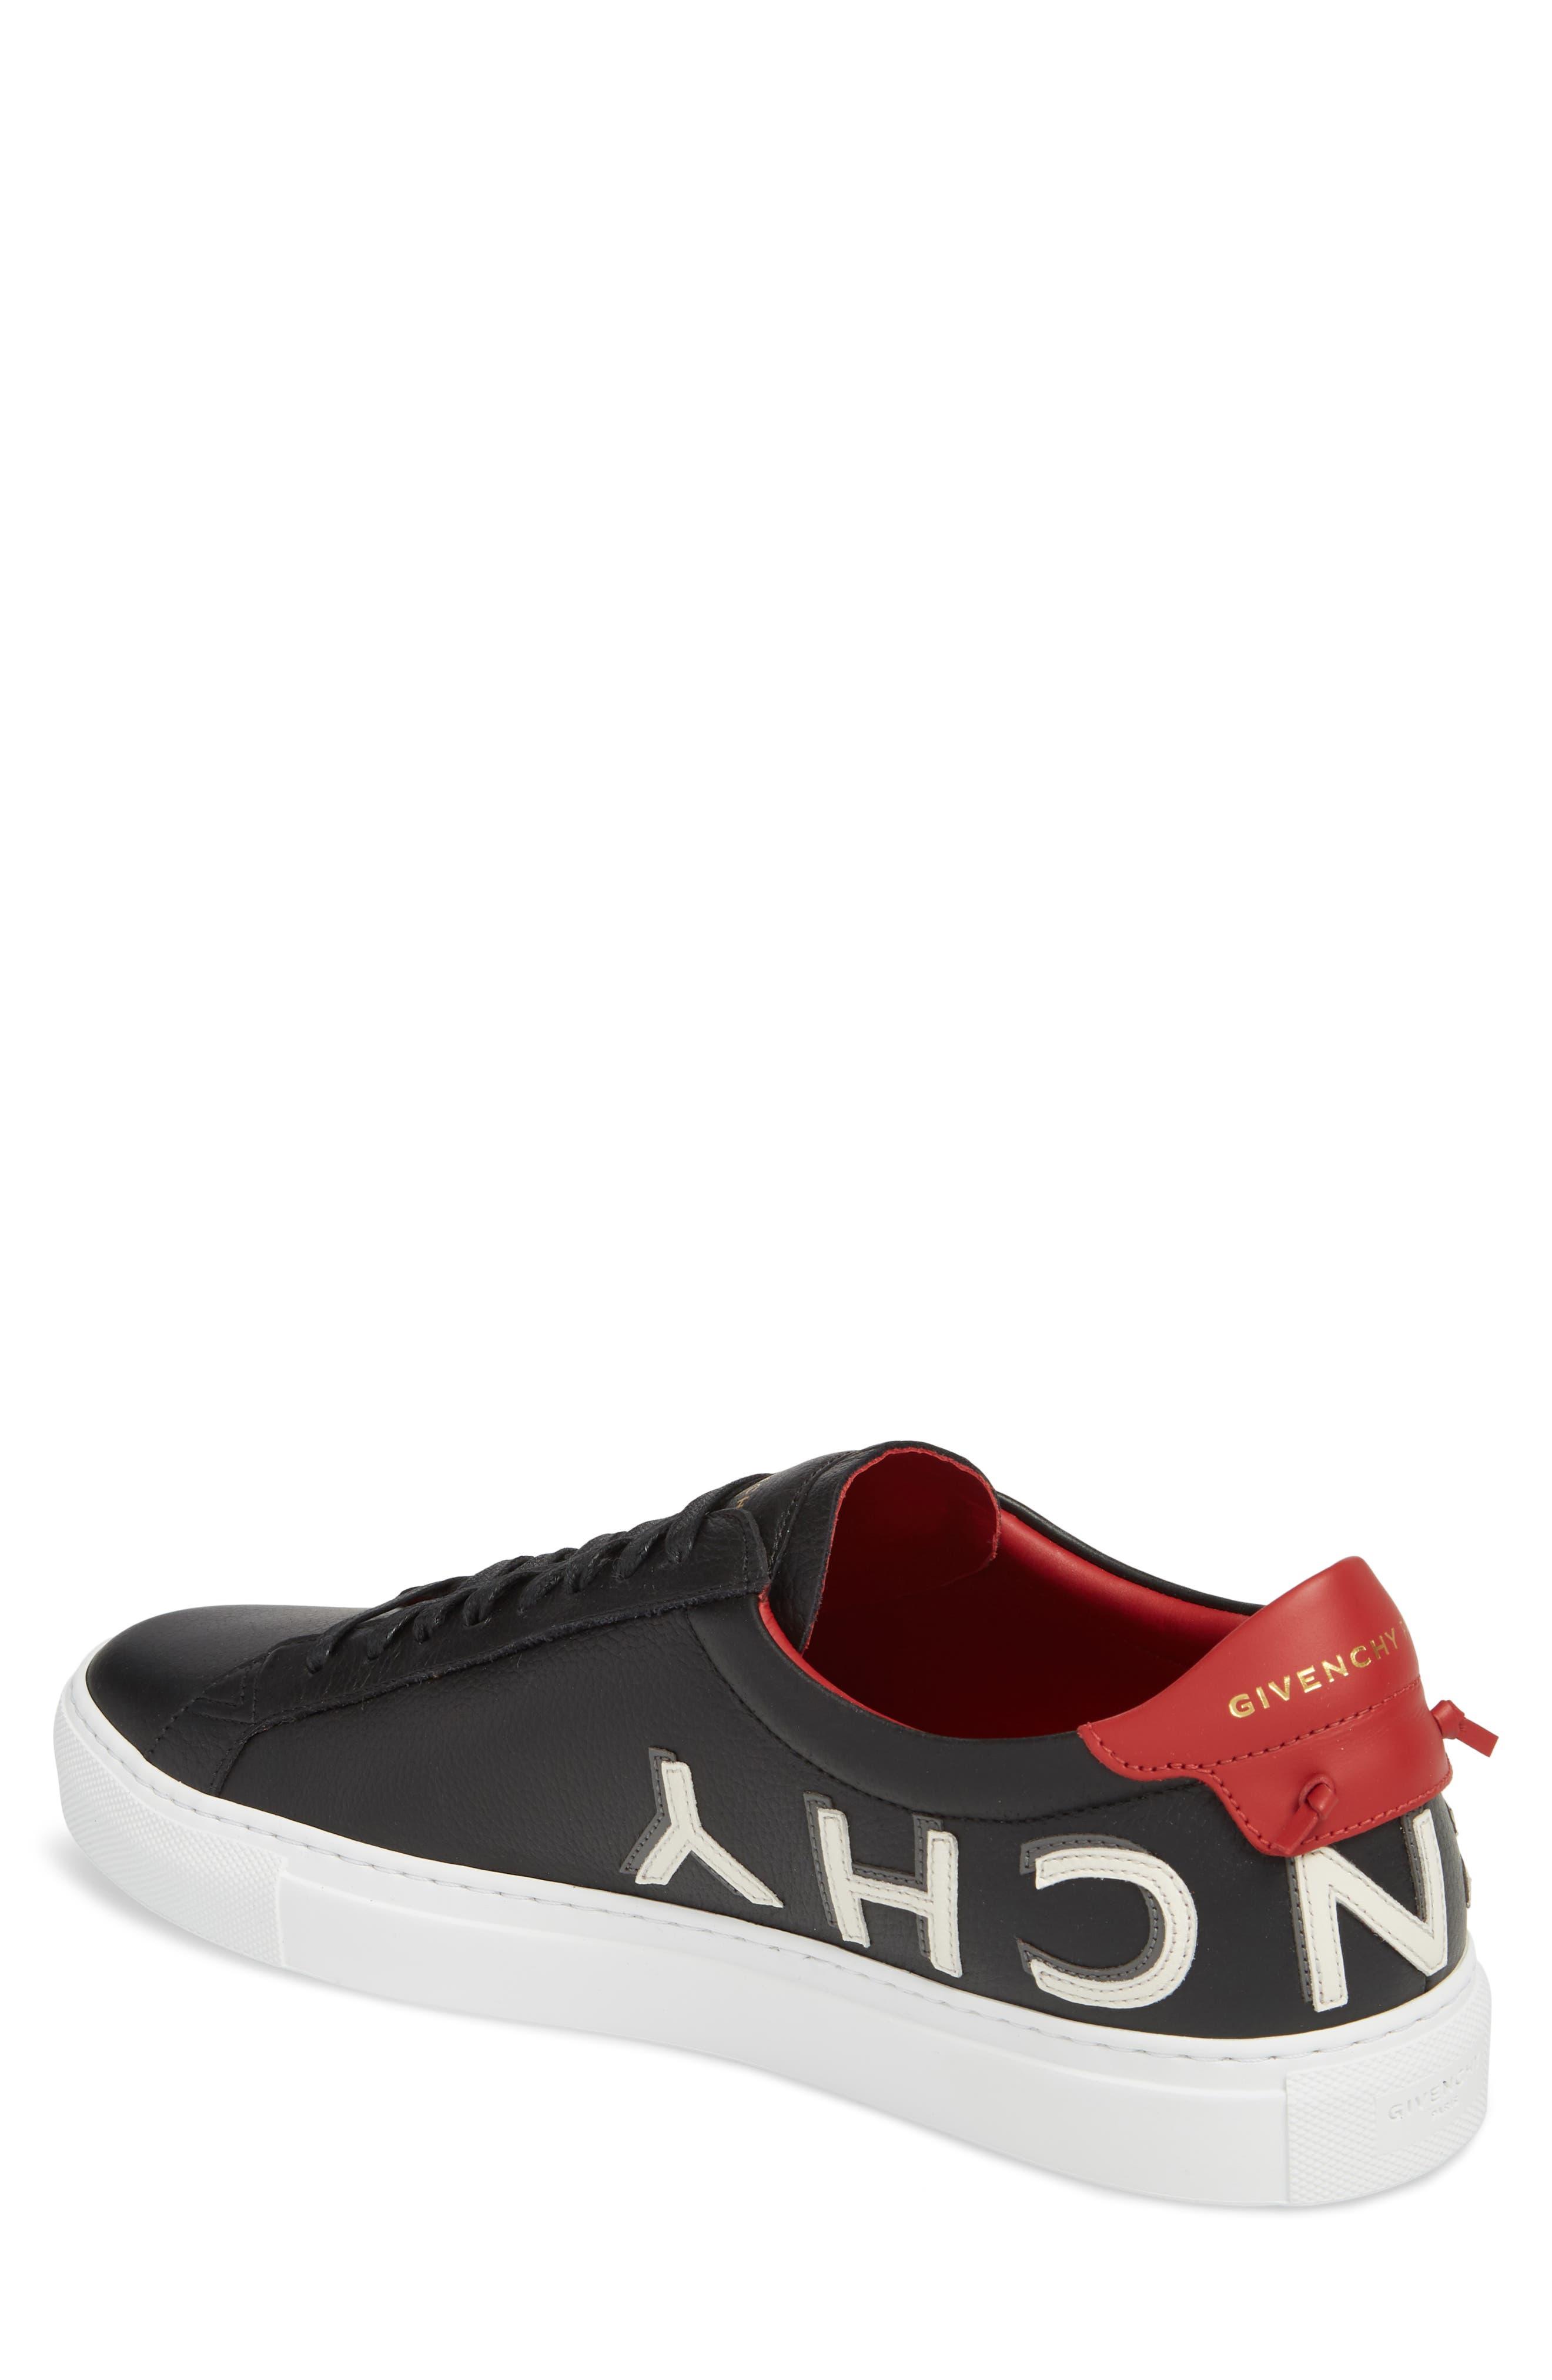 Urban Street Upside Down Sneaker,                             Alternate thumbnail 2, color,                             Black/ Red